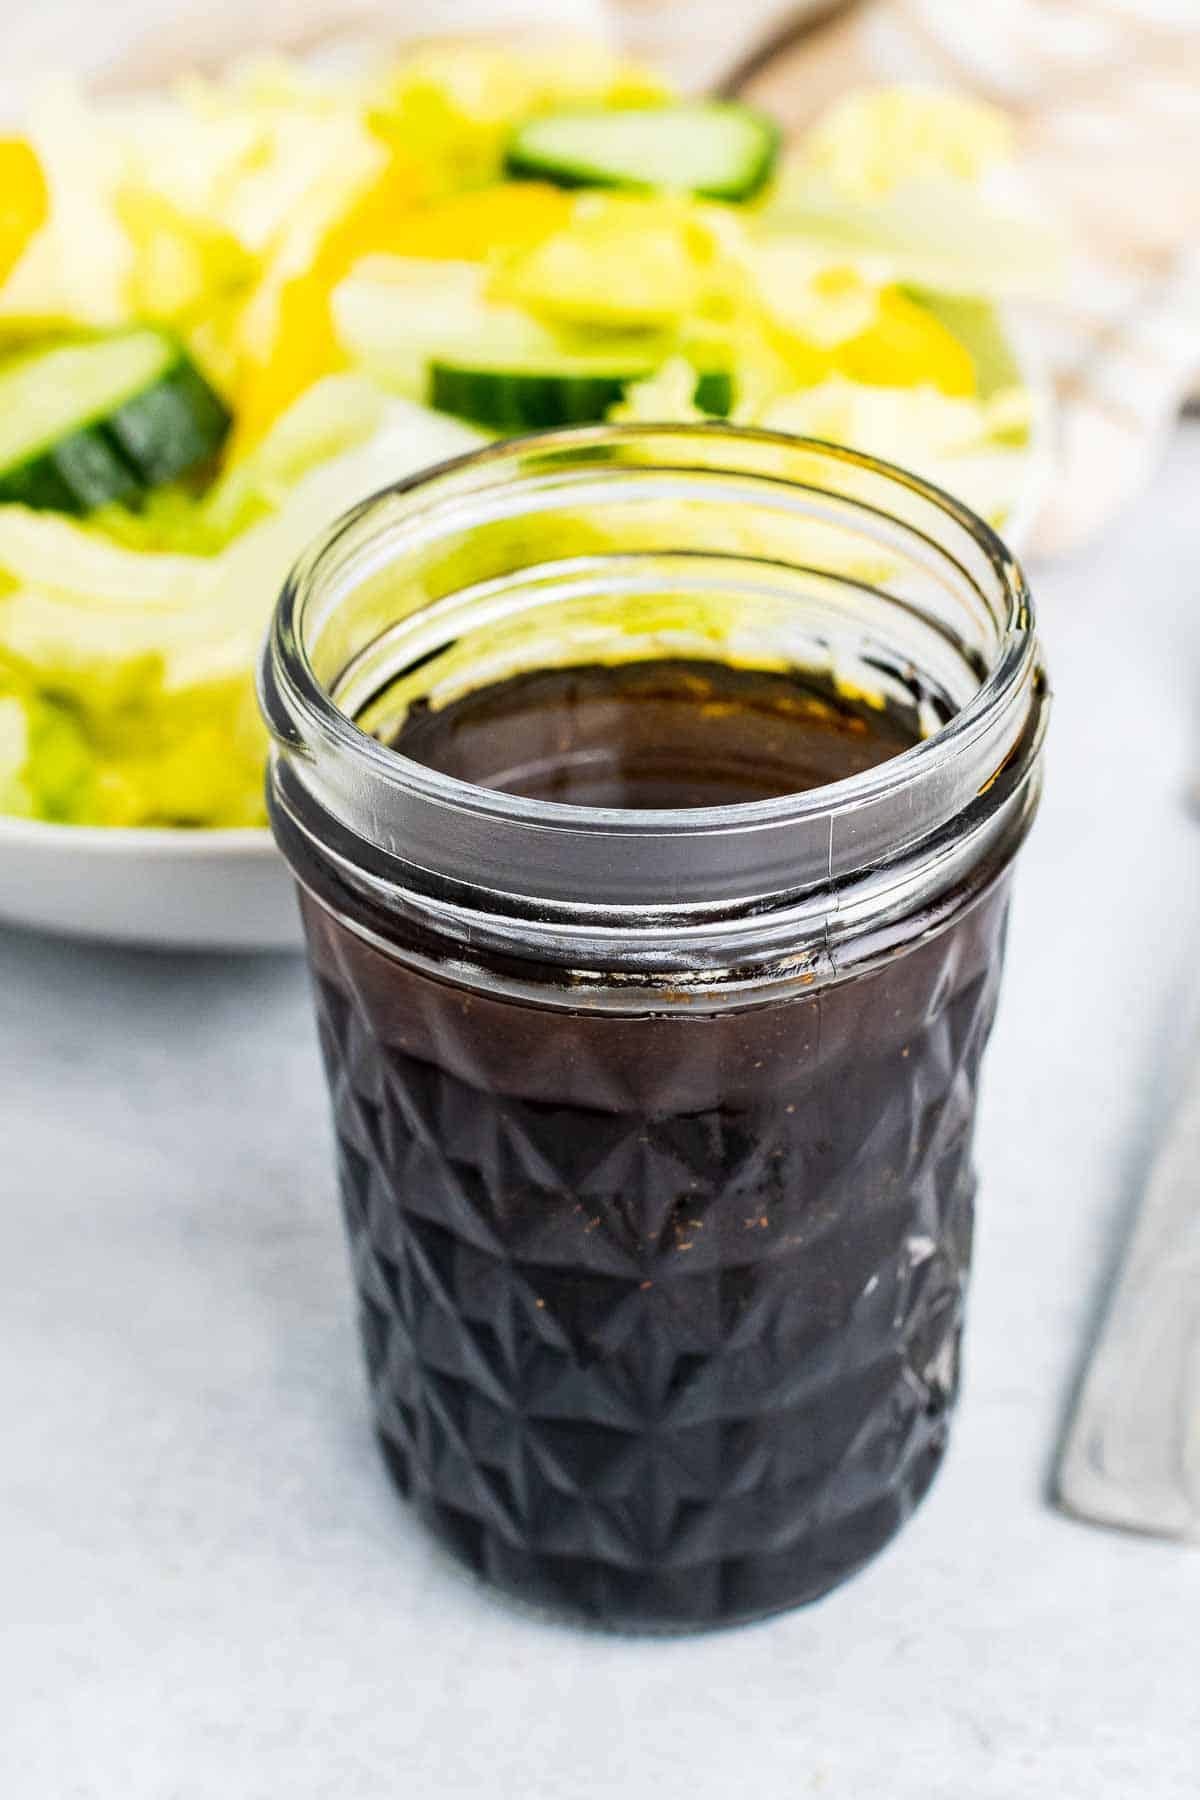 Glass of balsamic vinaigrette in front of salad bowl